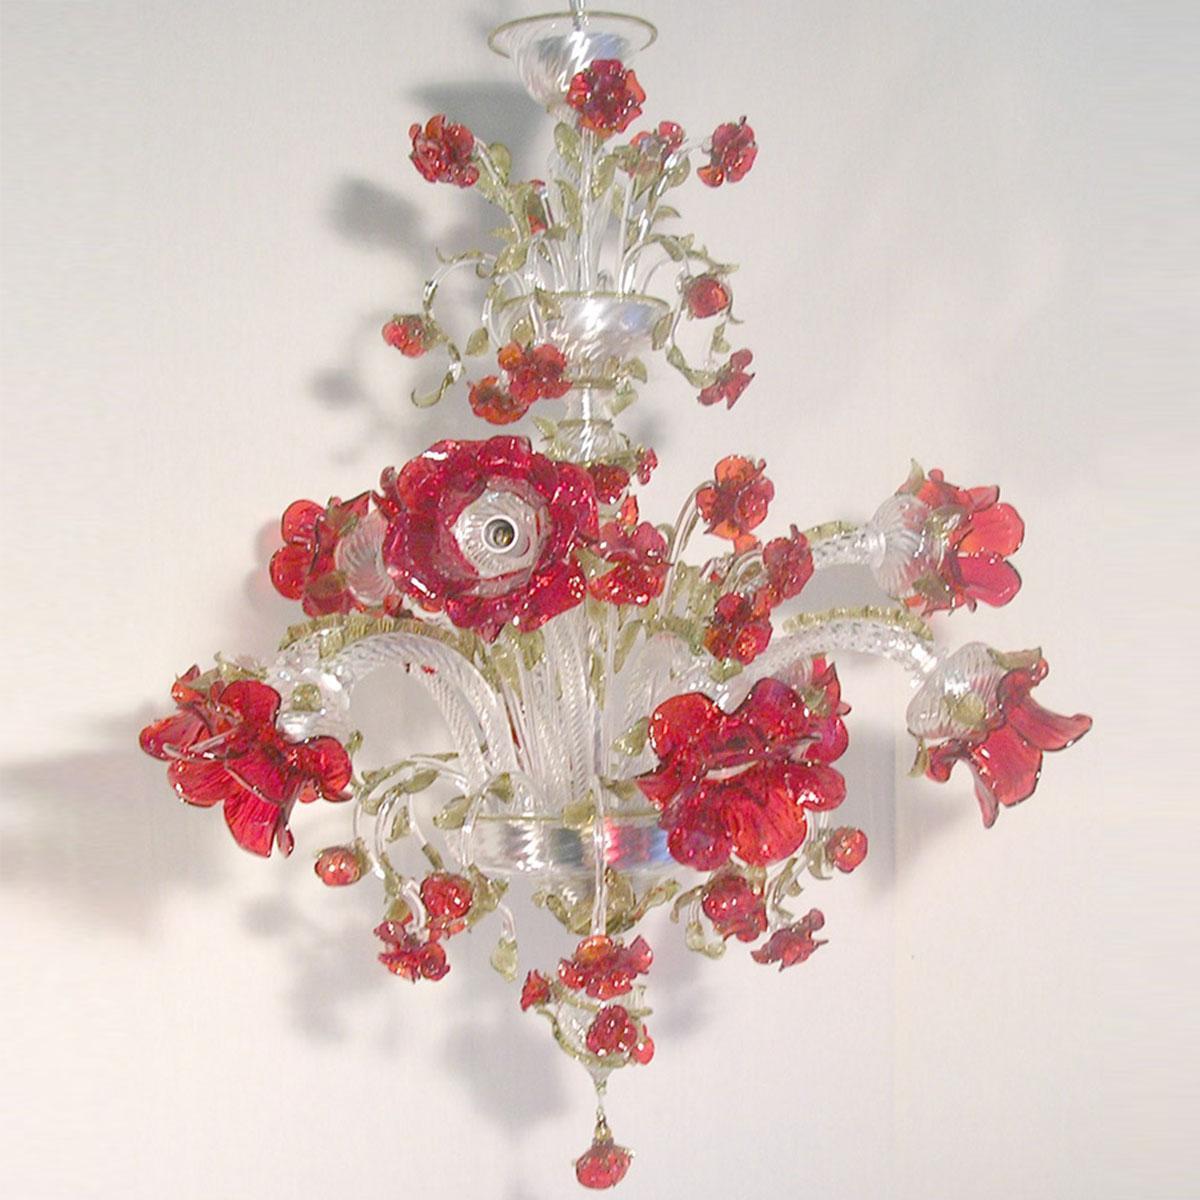 """Roseto Rosso"" Murano glas Kronleuchter - 9 flammig - transparent und rot"